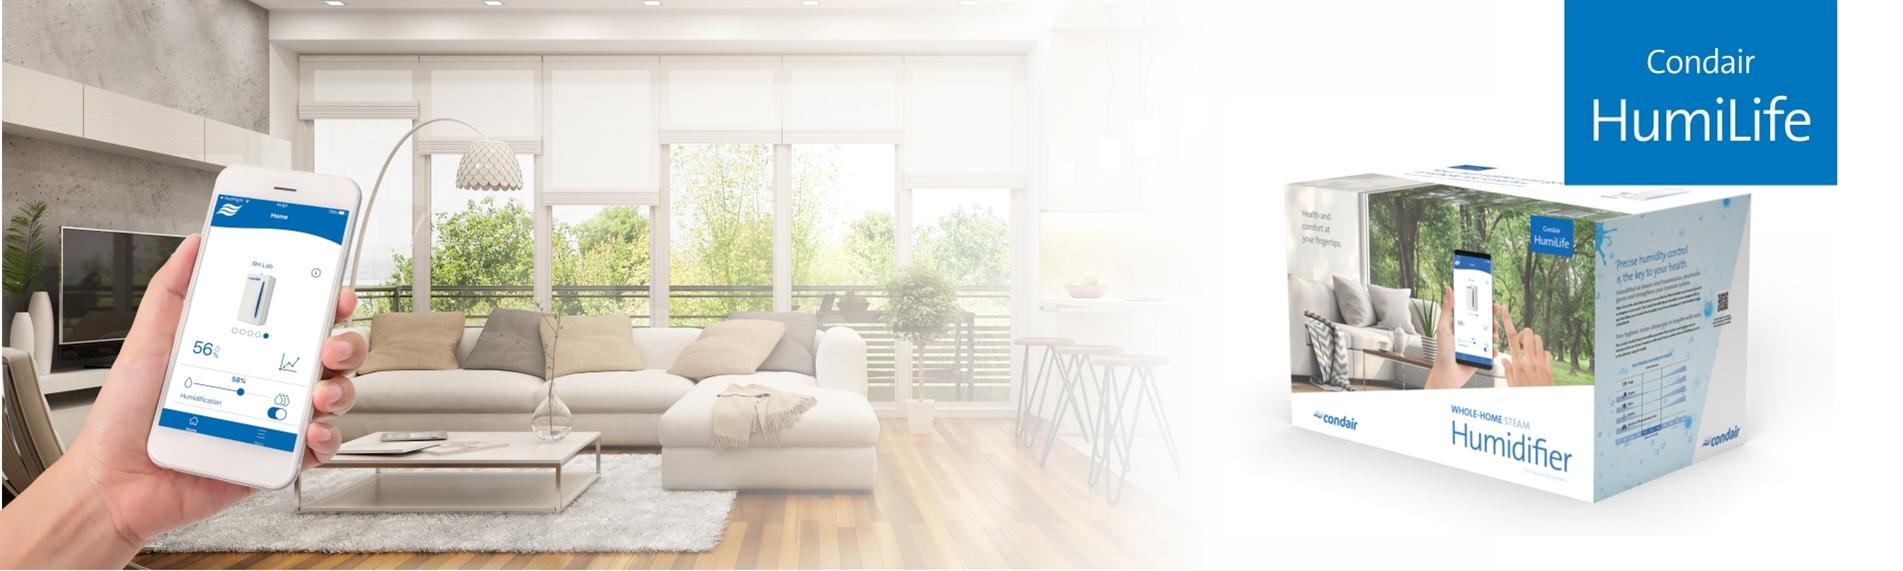 Condair HumiLife Whole-home Humidifiers